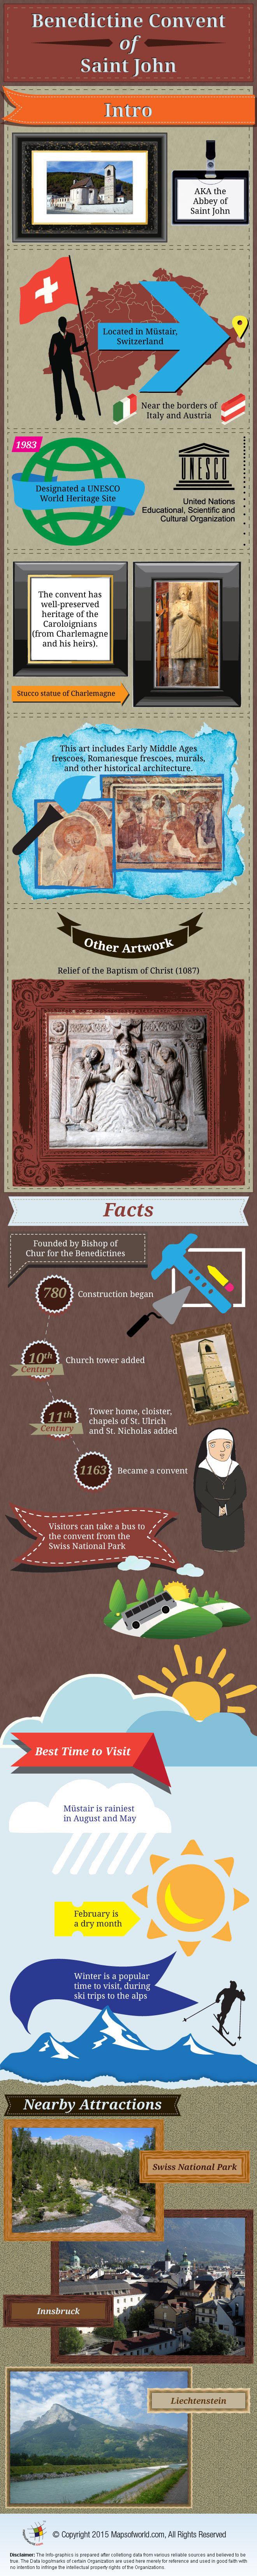 Benedictine Convent of Saint John Infographic